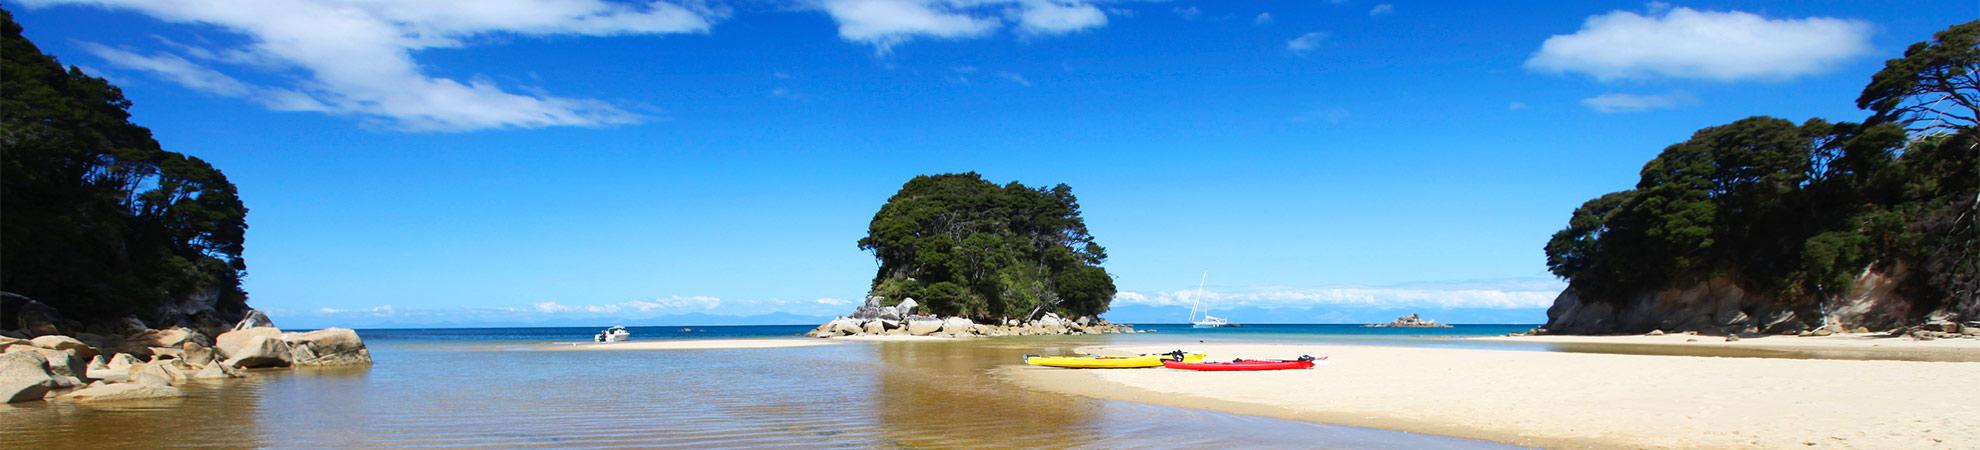 Journée de rêve en kayak à Abel Tasman